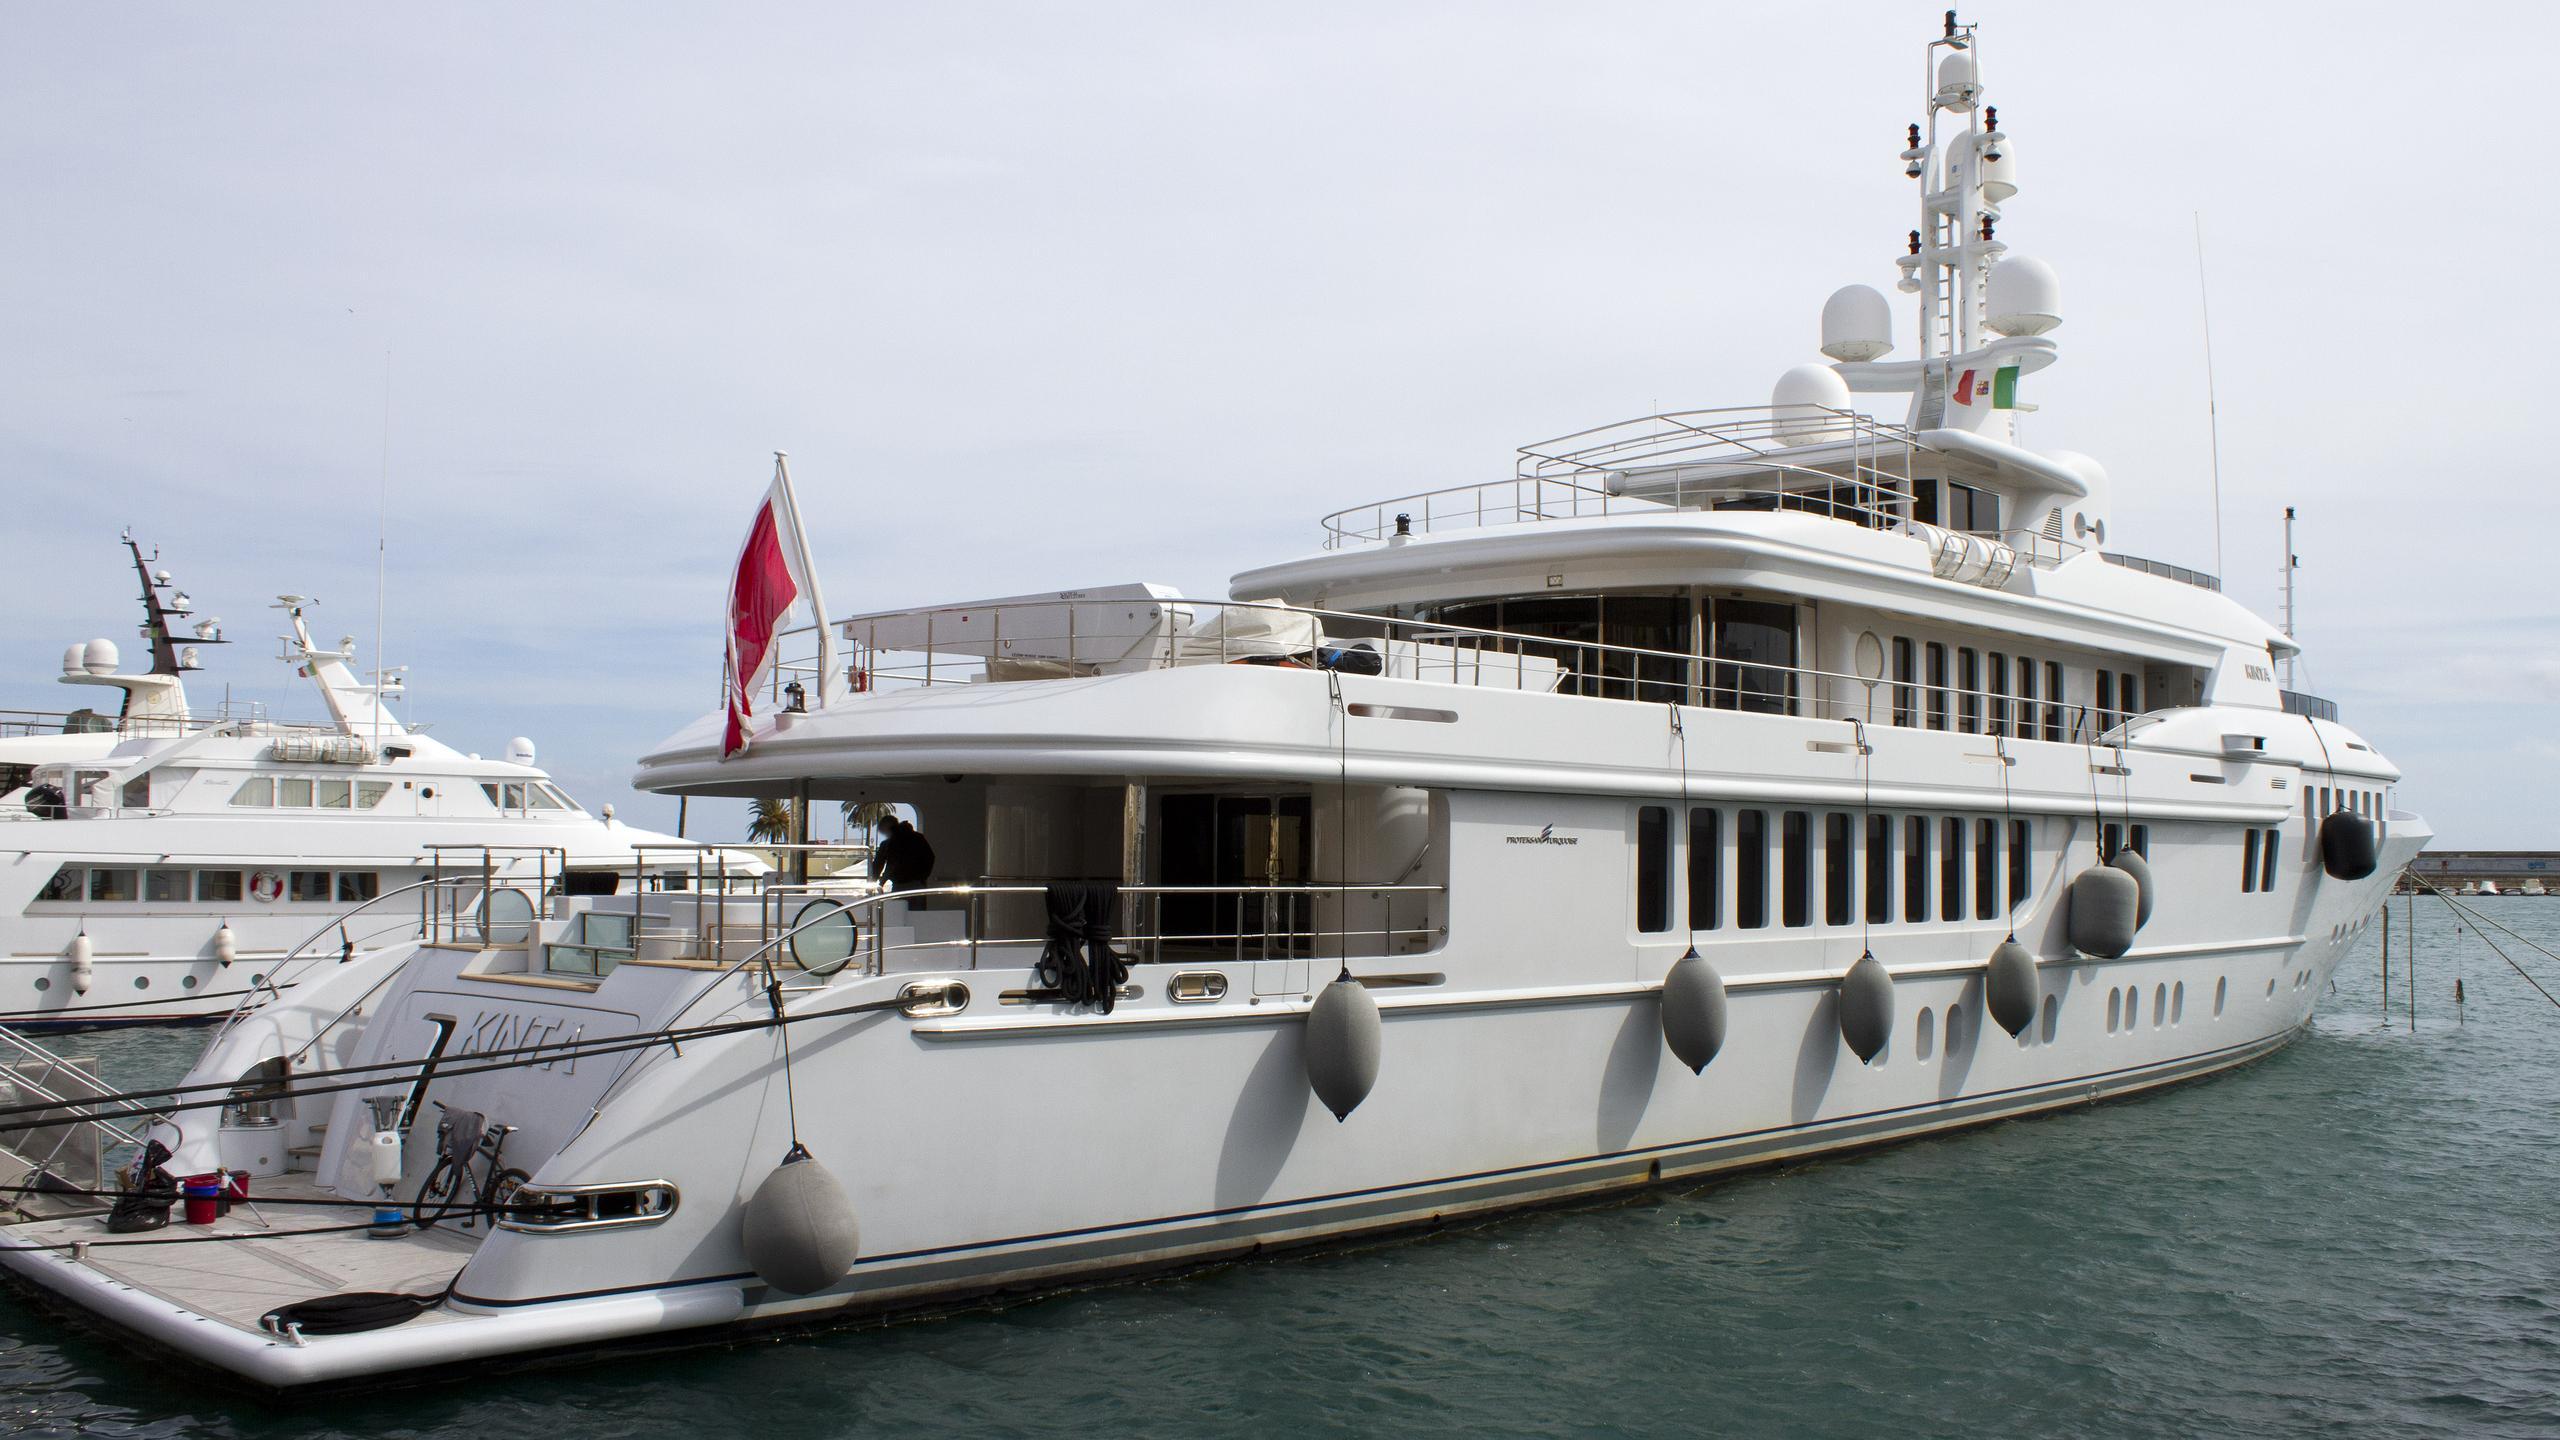 kinta-explorer-yacht-turquoise-2008-53m-stern-profile